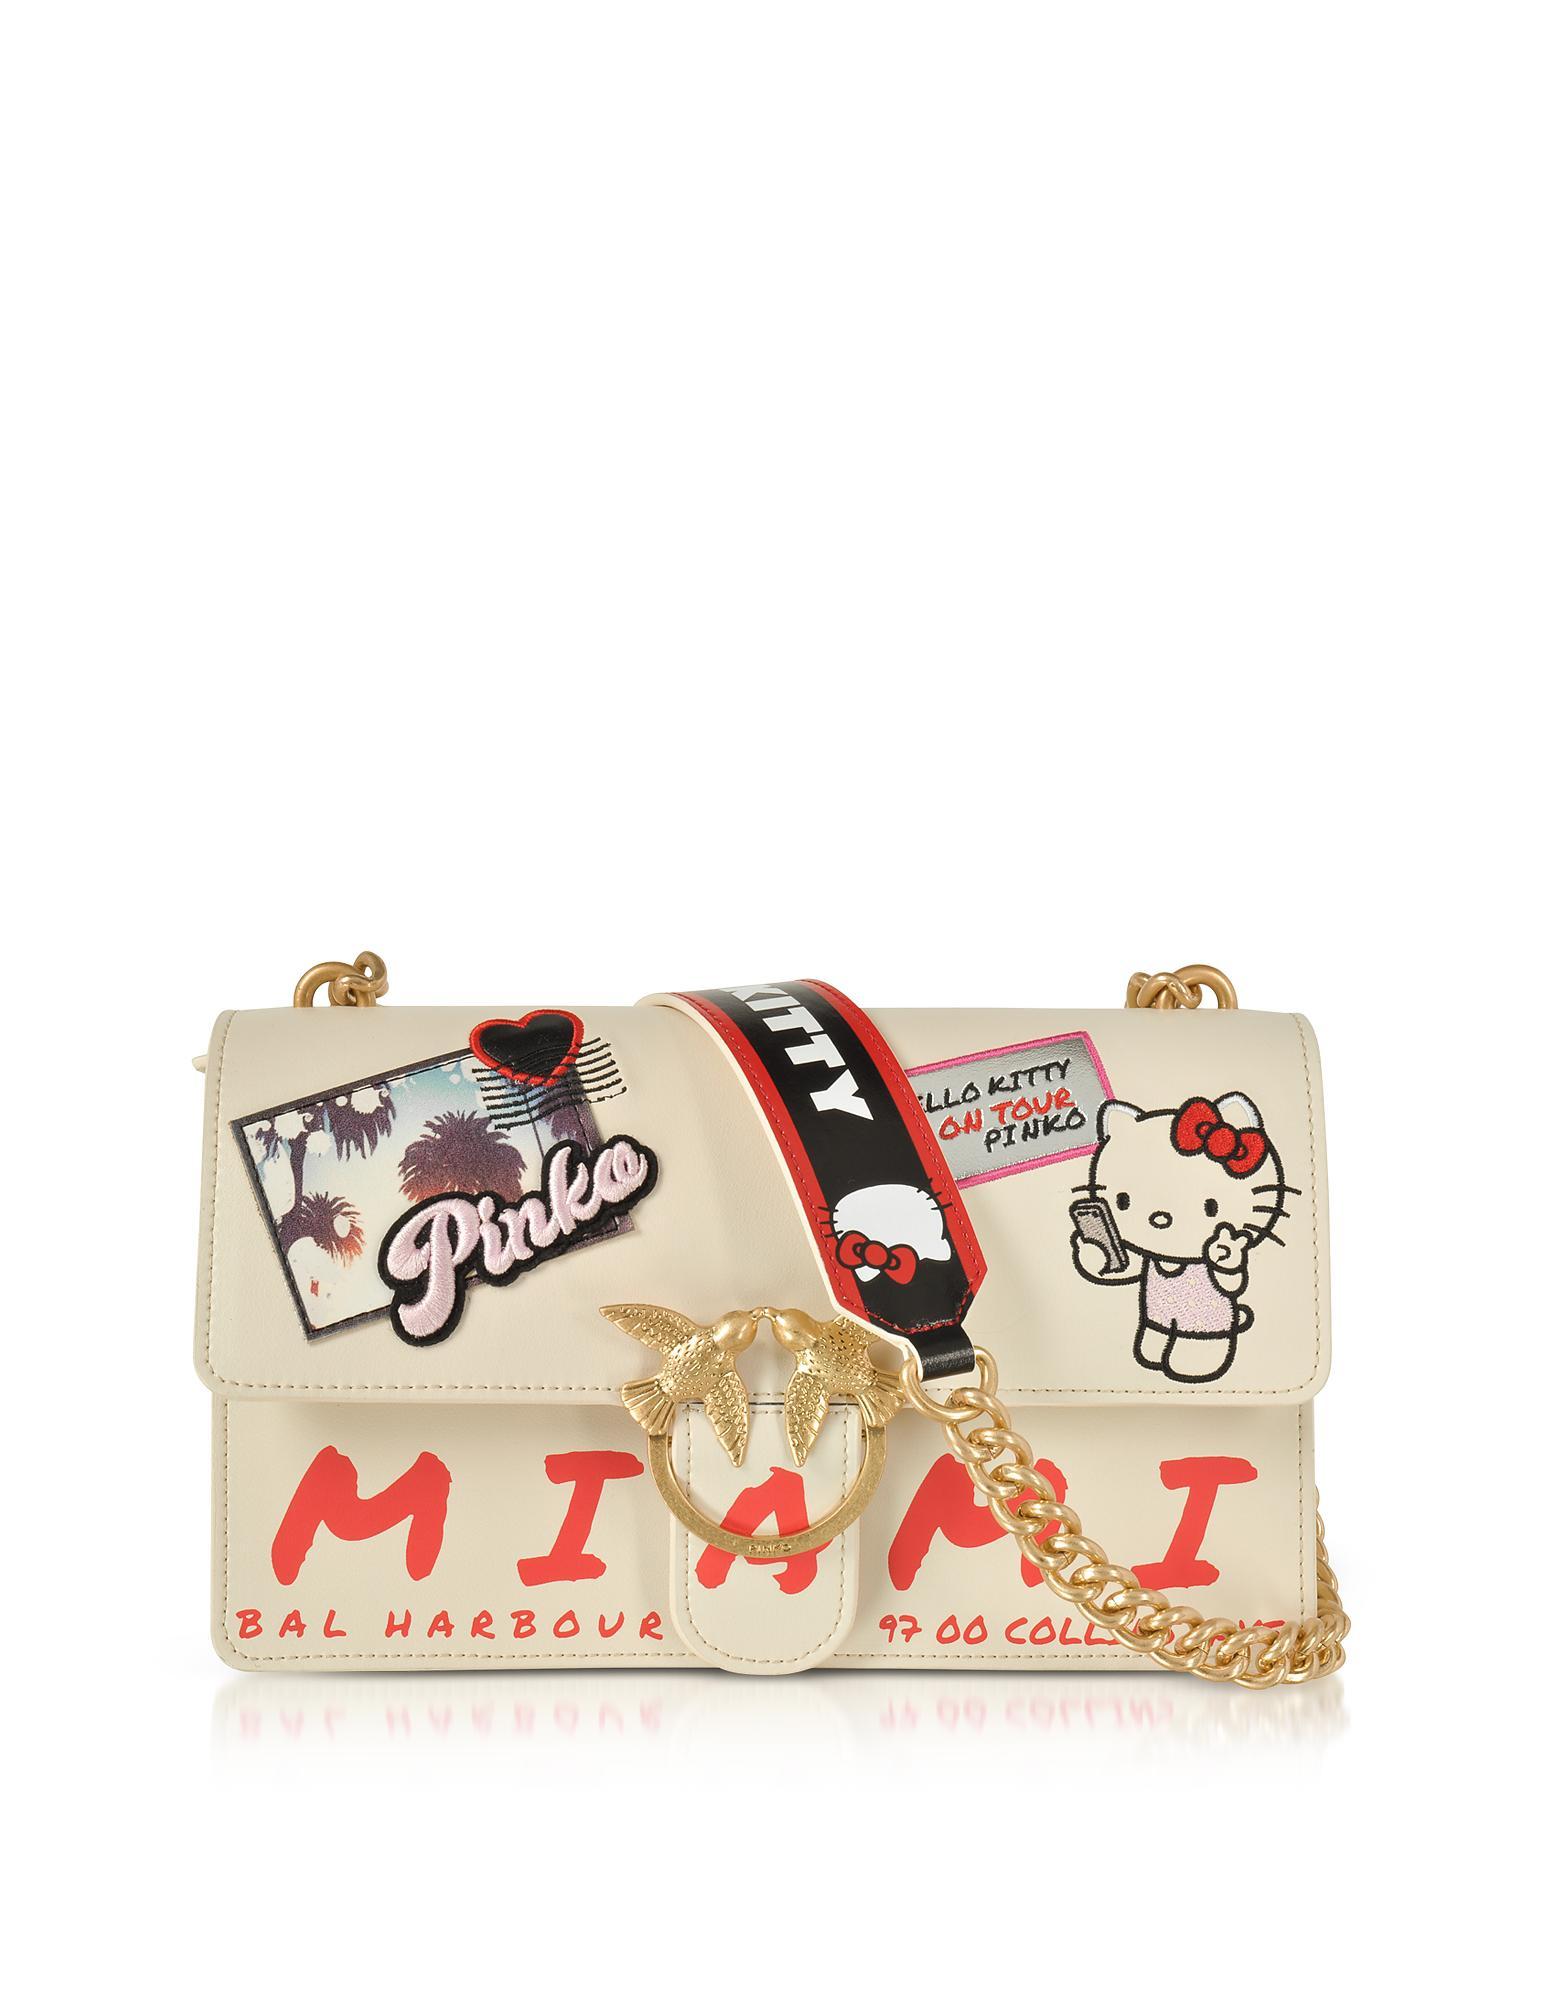 9256eb1aa Pinko Love Hello Kitty Souvernir White Eco Leather Shoulder Bag in ...